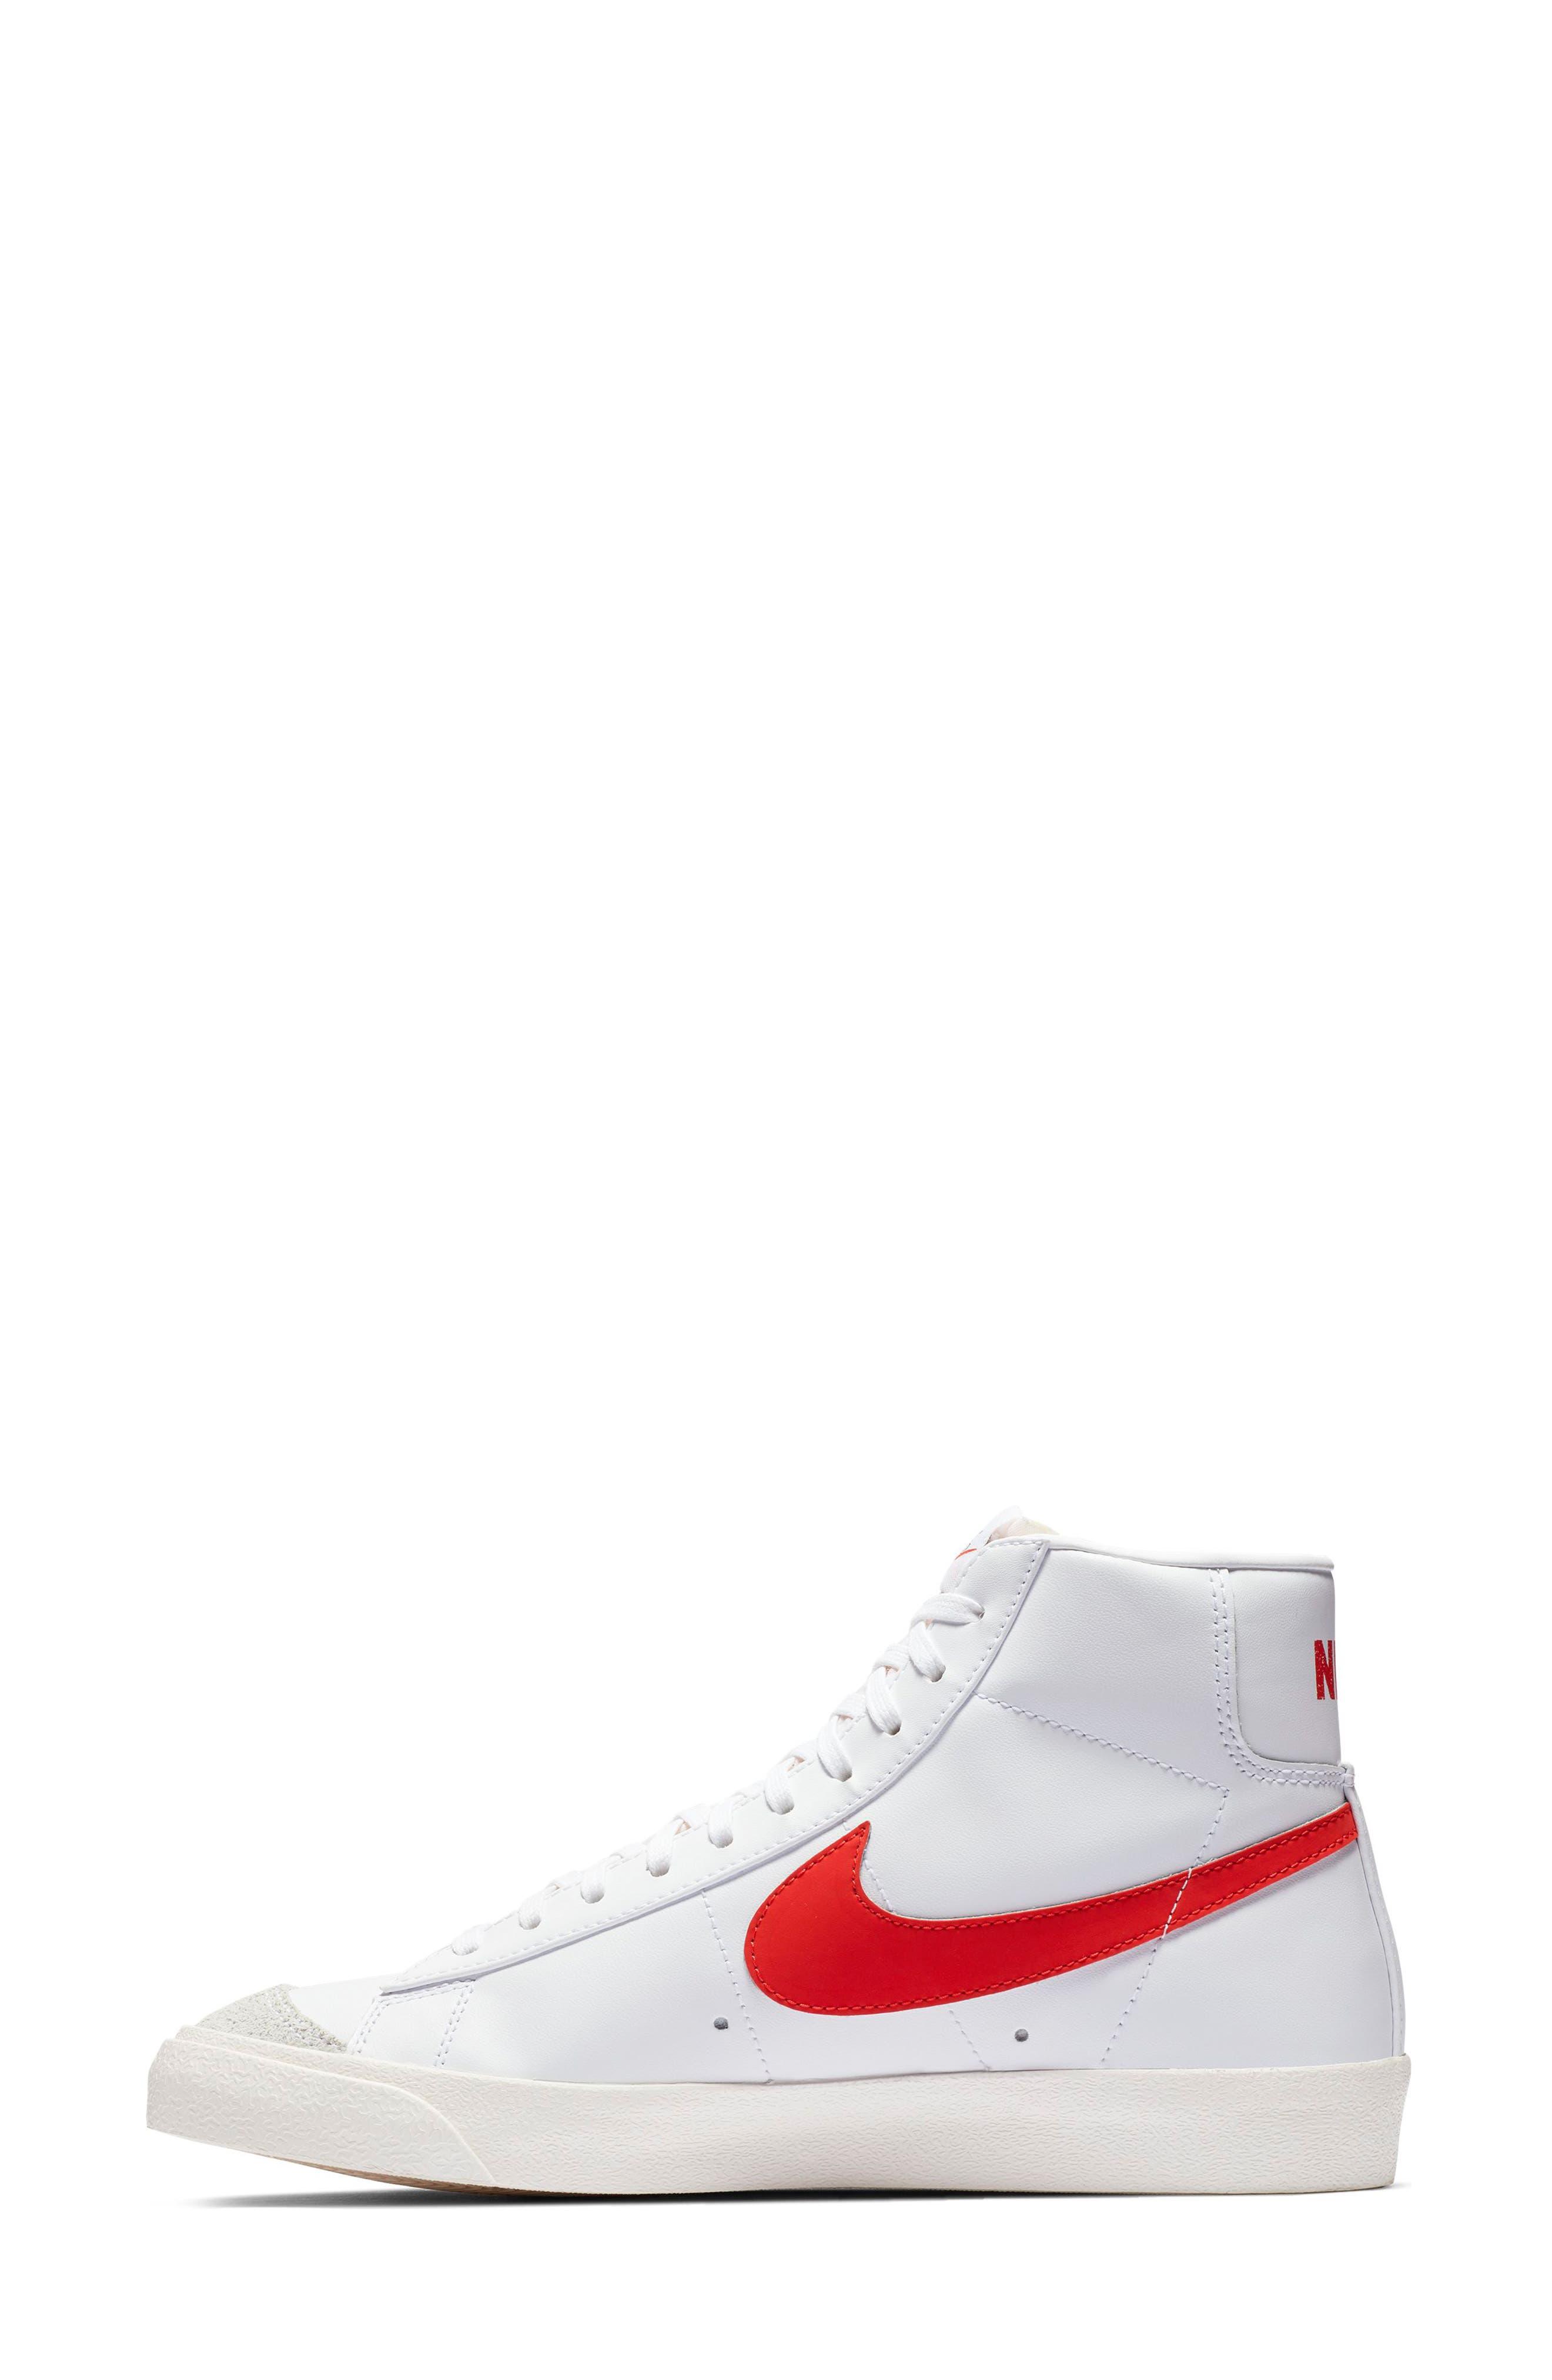 Blazer Mid '77 Vintage Sneaker,                             Alternate thumbnail 3, color,                             HABANERO RED/ SAIL/ WHITE